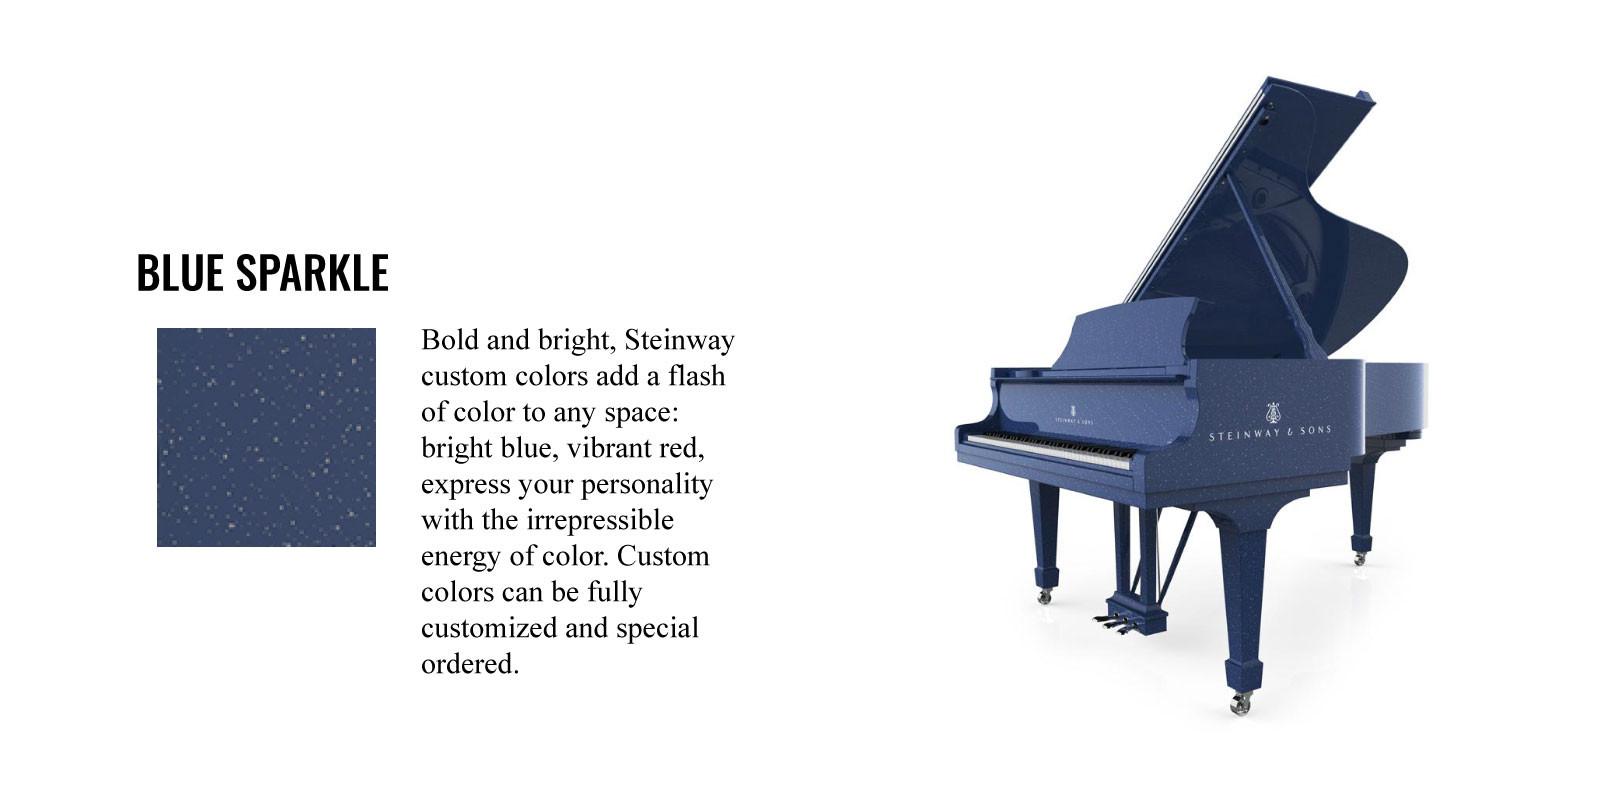 PP-Steinway-Custom-Color-Slideshow-11.jp